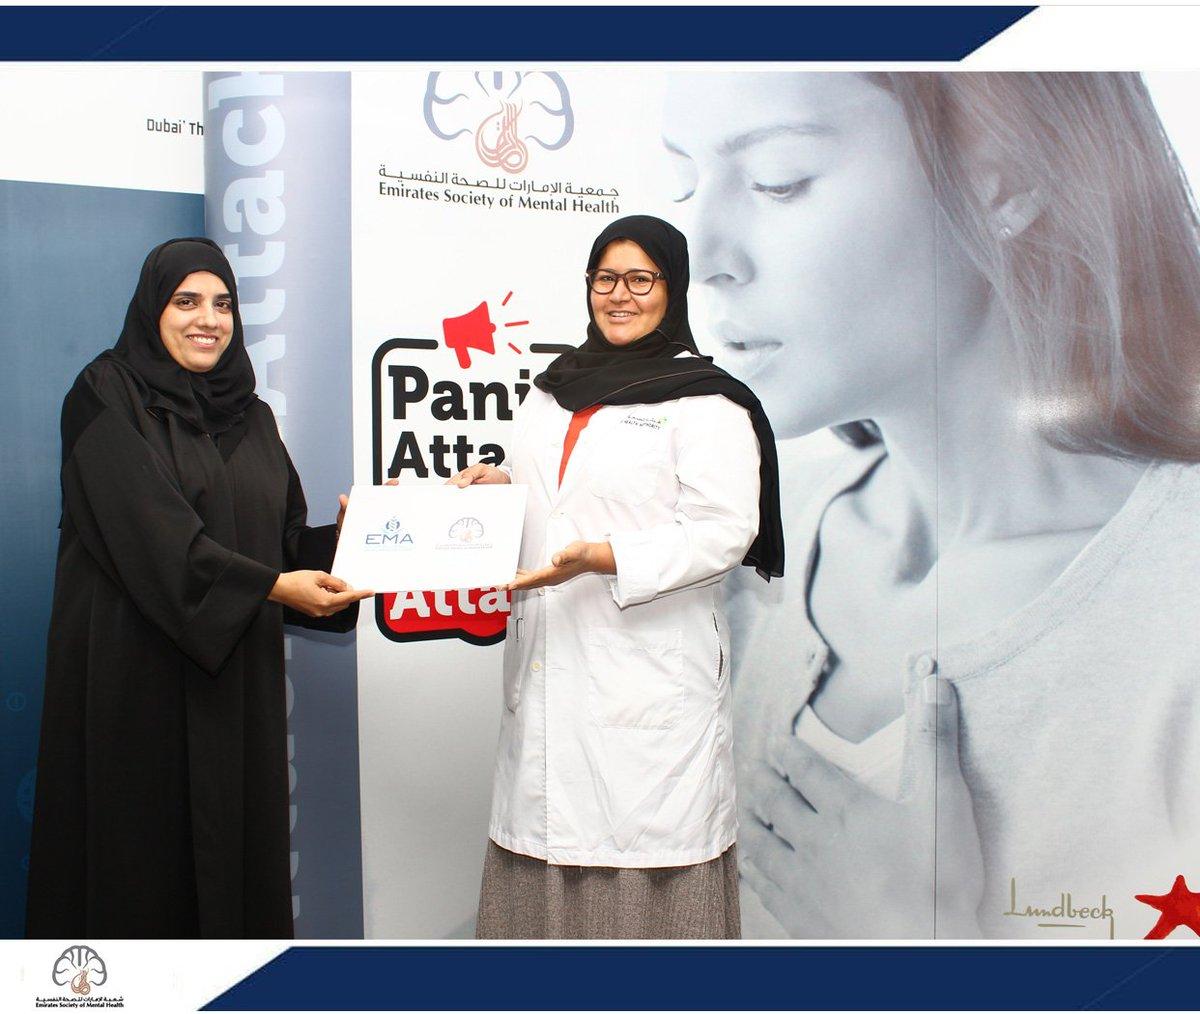 """Panic Attack or Heart Attack"" by Emirates Society of Mental Health happened last 25 October @ Rashid Hospital, Hall B - Dubai Health Authority.   Conducted by Dr. Samia Alkhoori @samia.abul 👩🏻⚕️   #EMA #ESMH #MentalHealth #MentalHealthAwareness #PanicAttack #HeartAttack #2018"